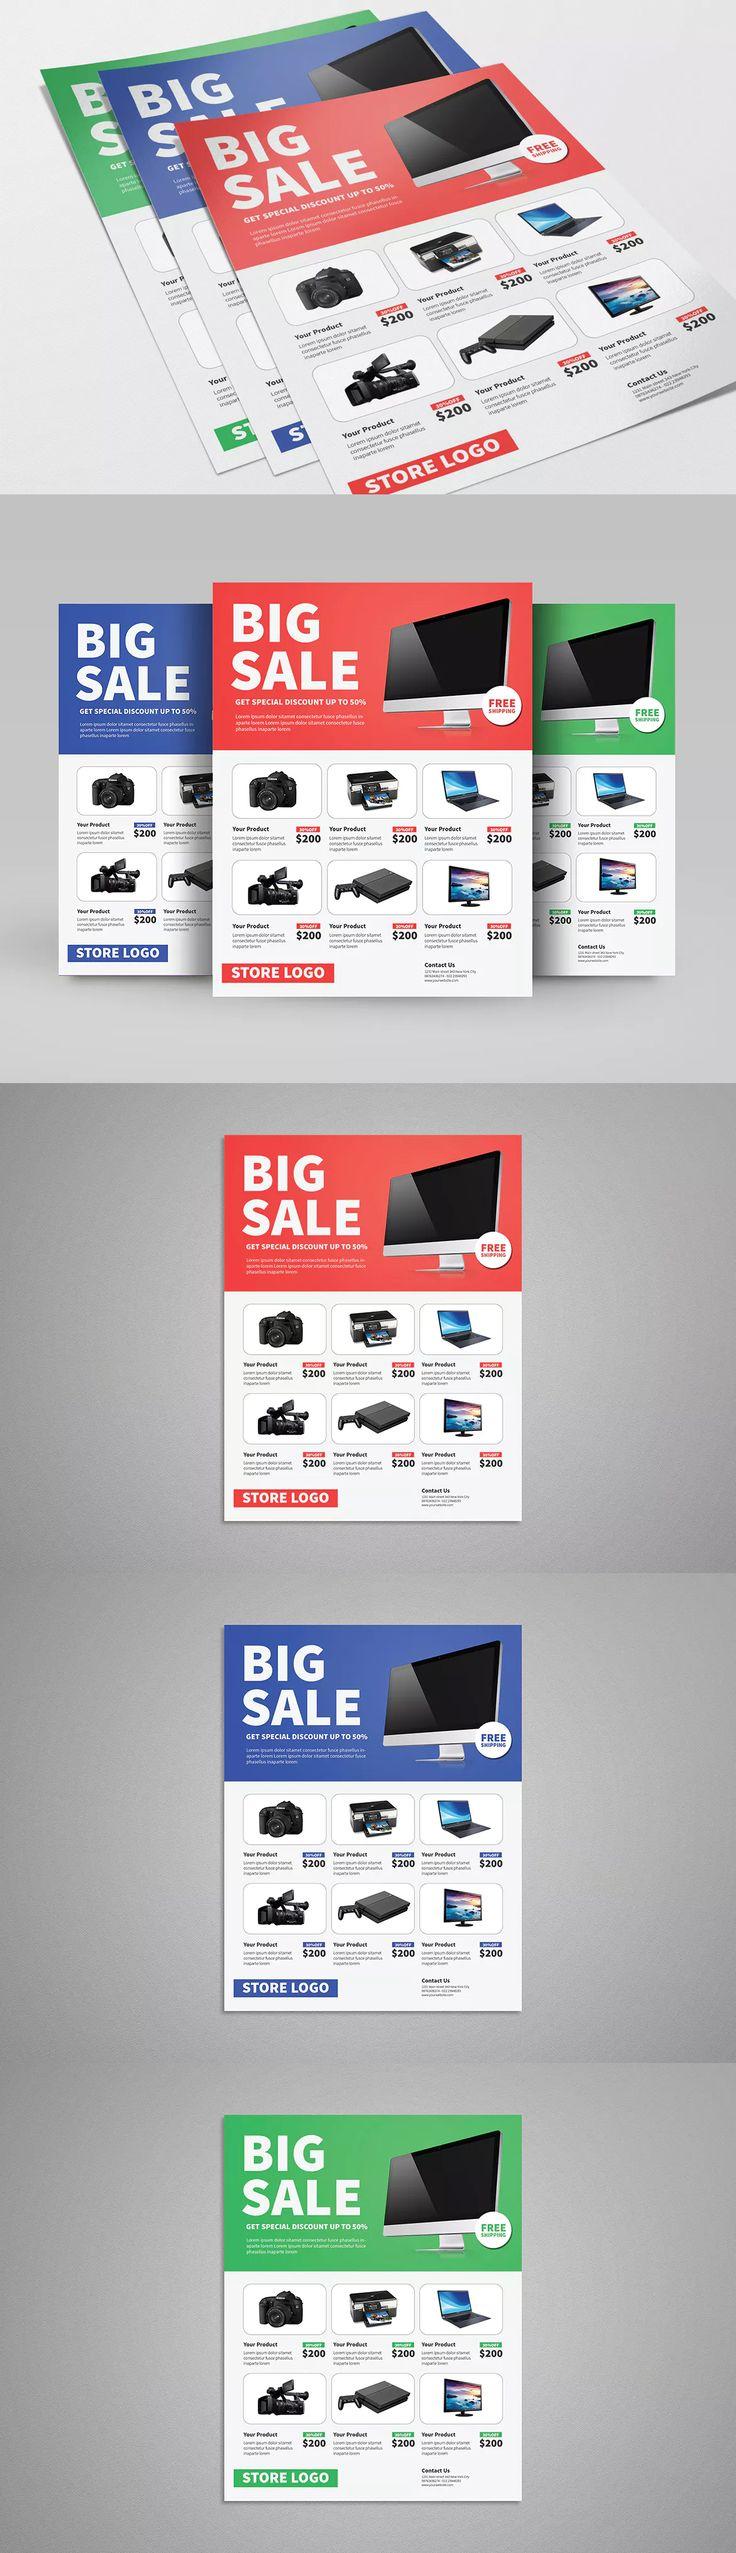 Clean Sale Flyer Template PSD